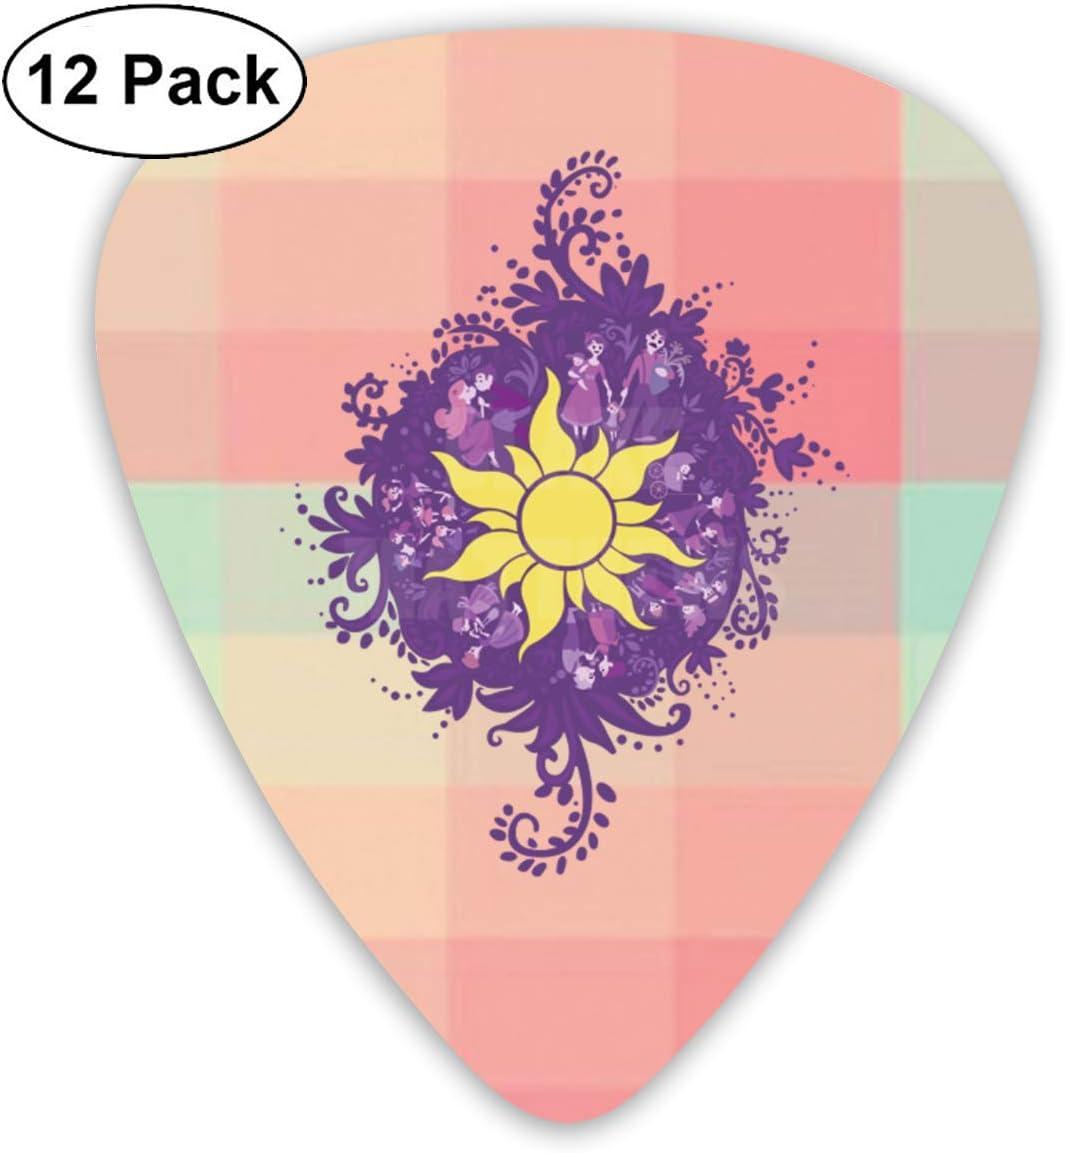 Tuiu Tangled Sun Symbol 12 Pack Classic Guitar Picks Plectrums For Electric Guitar Original Voice Guitar Mandolin And Bass Amazon Co Uk Musical Instruments